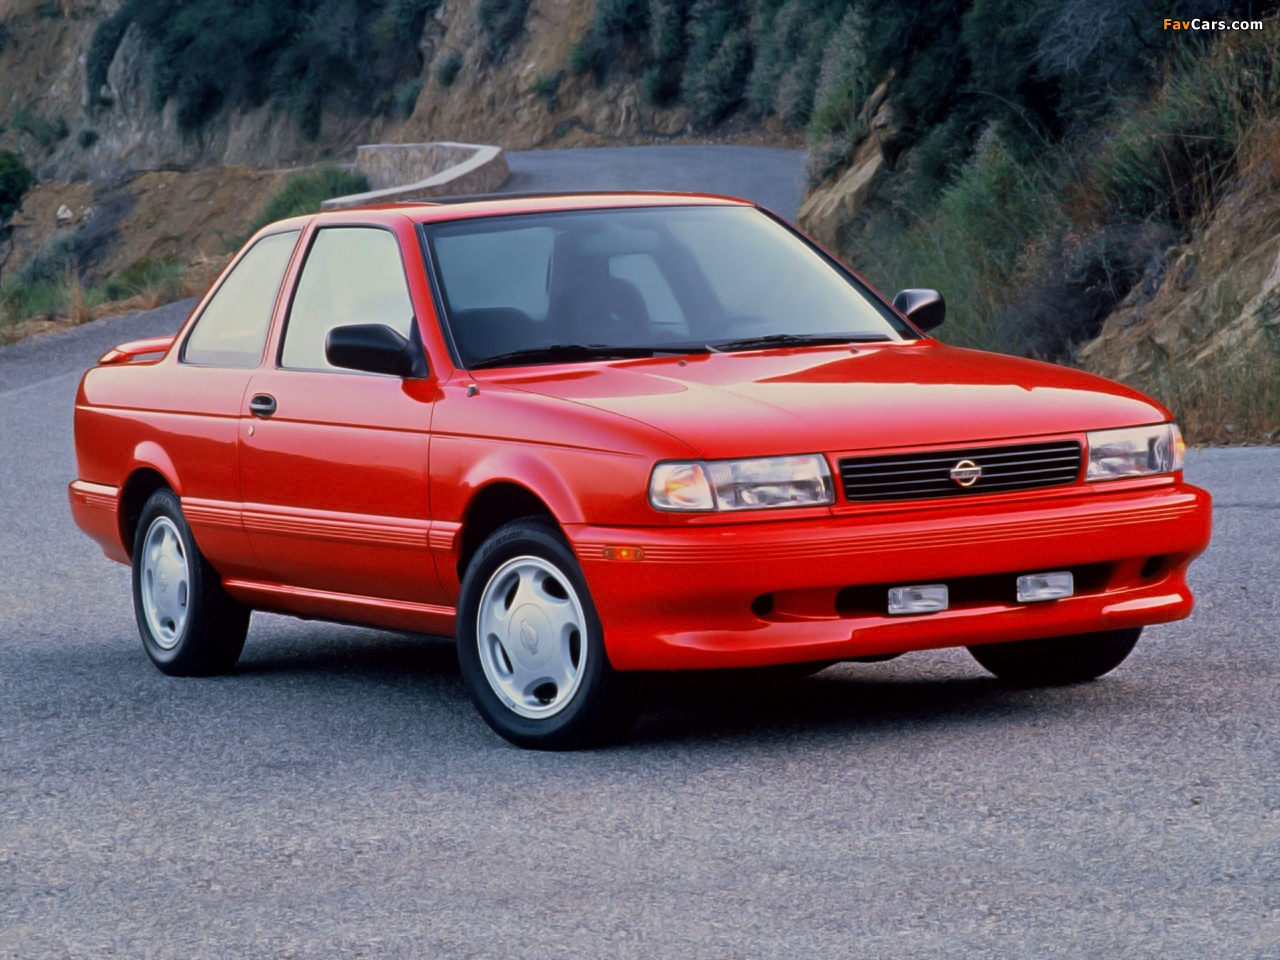 Nissan Sentra Se R Coupe B13 1991 94 Photos 1280x960